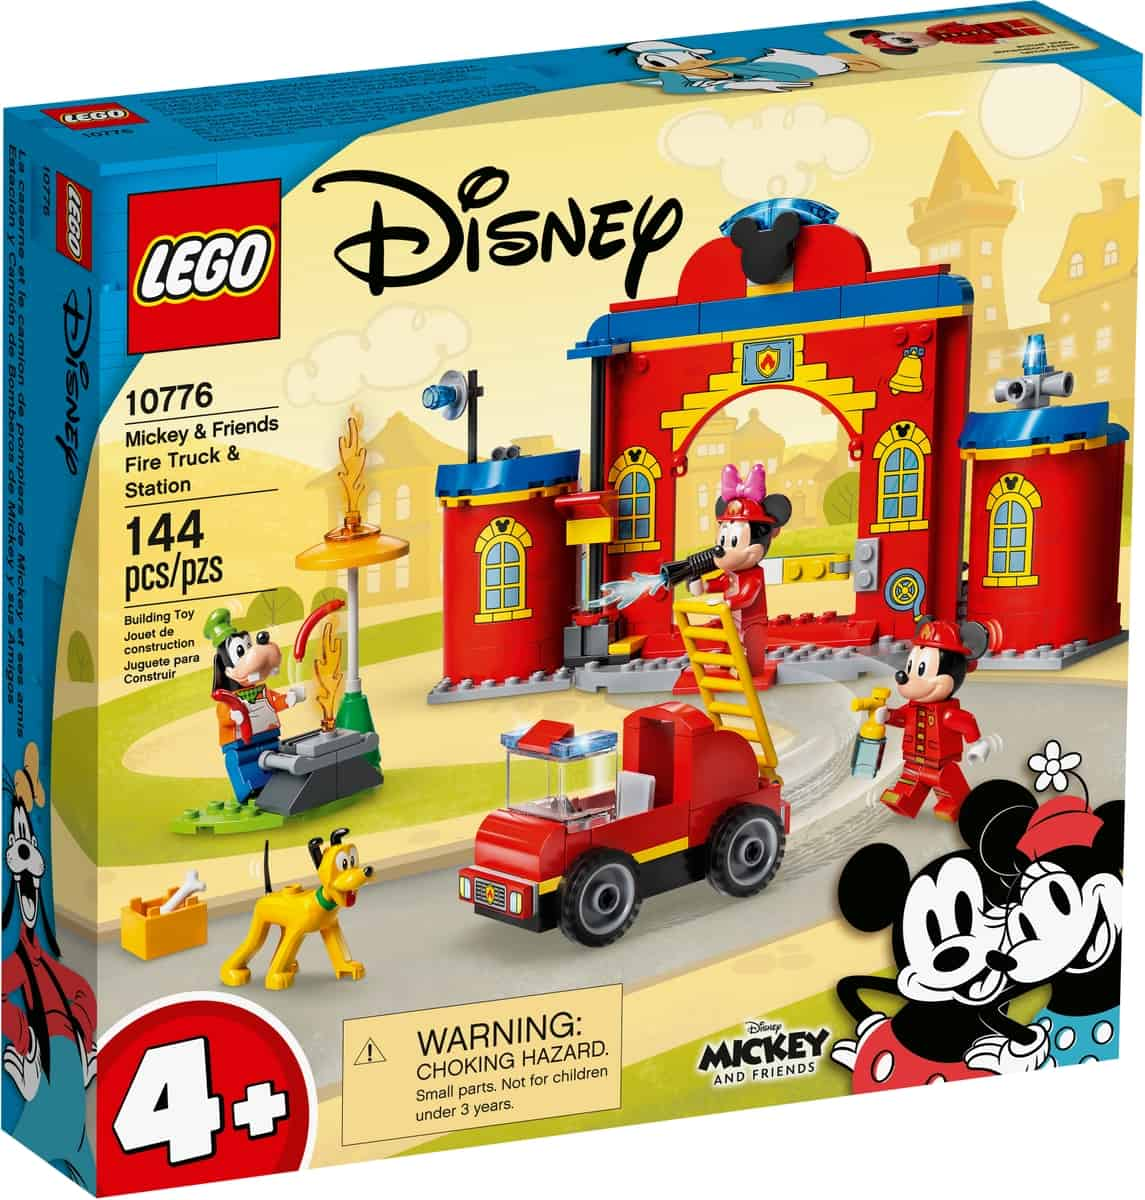 lego 10776 mickey friends fire truck station